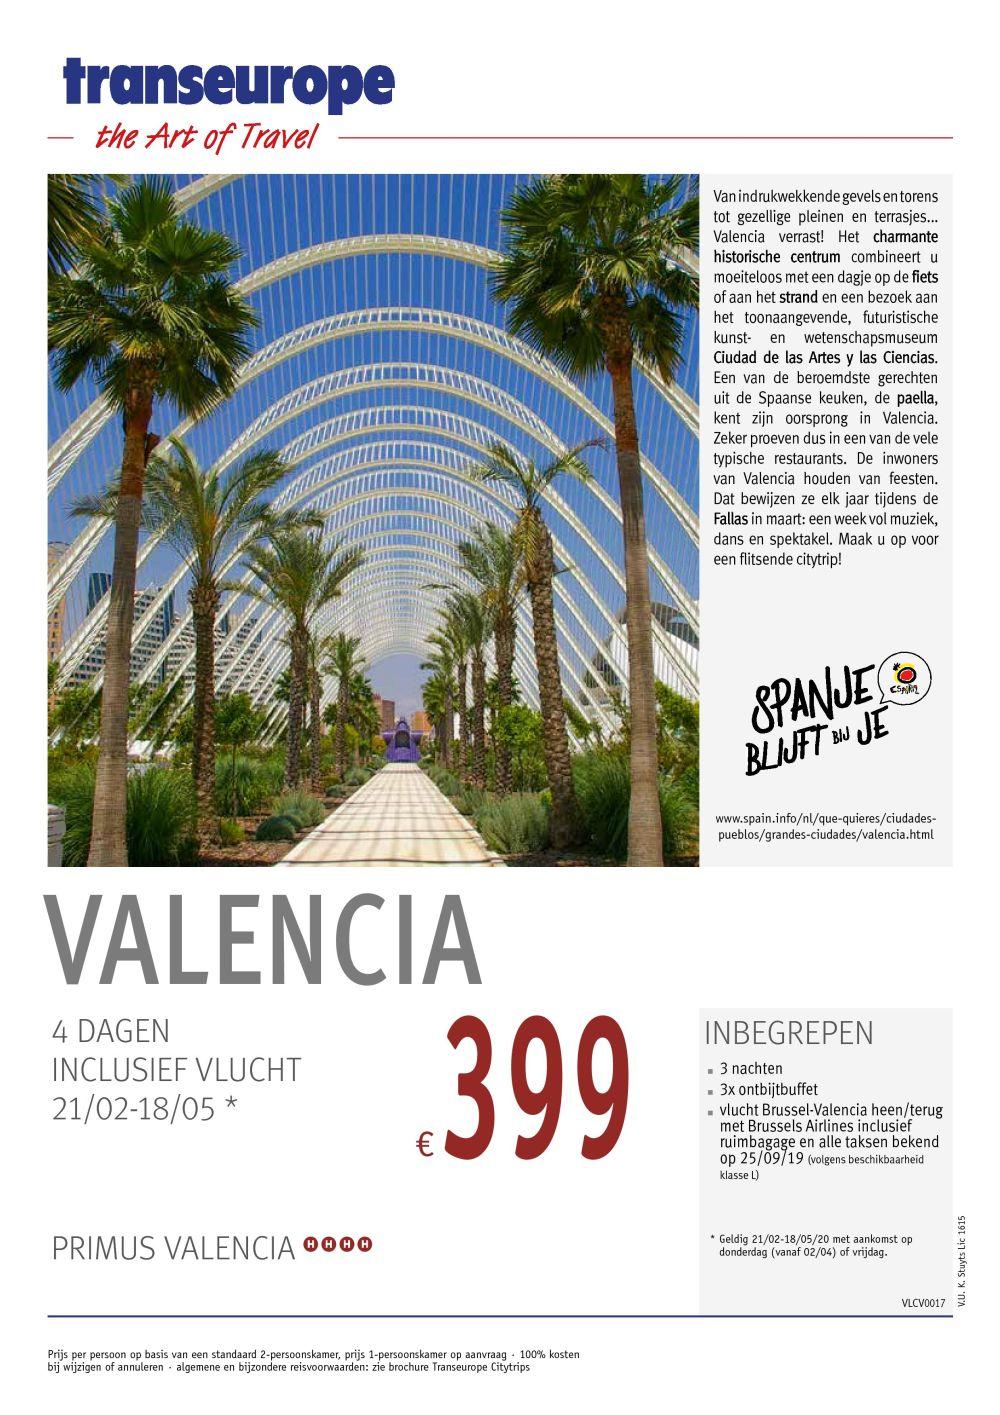 Last Minutes en Promoties - Transeurope - Valencia